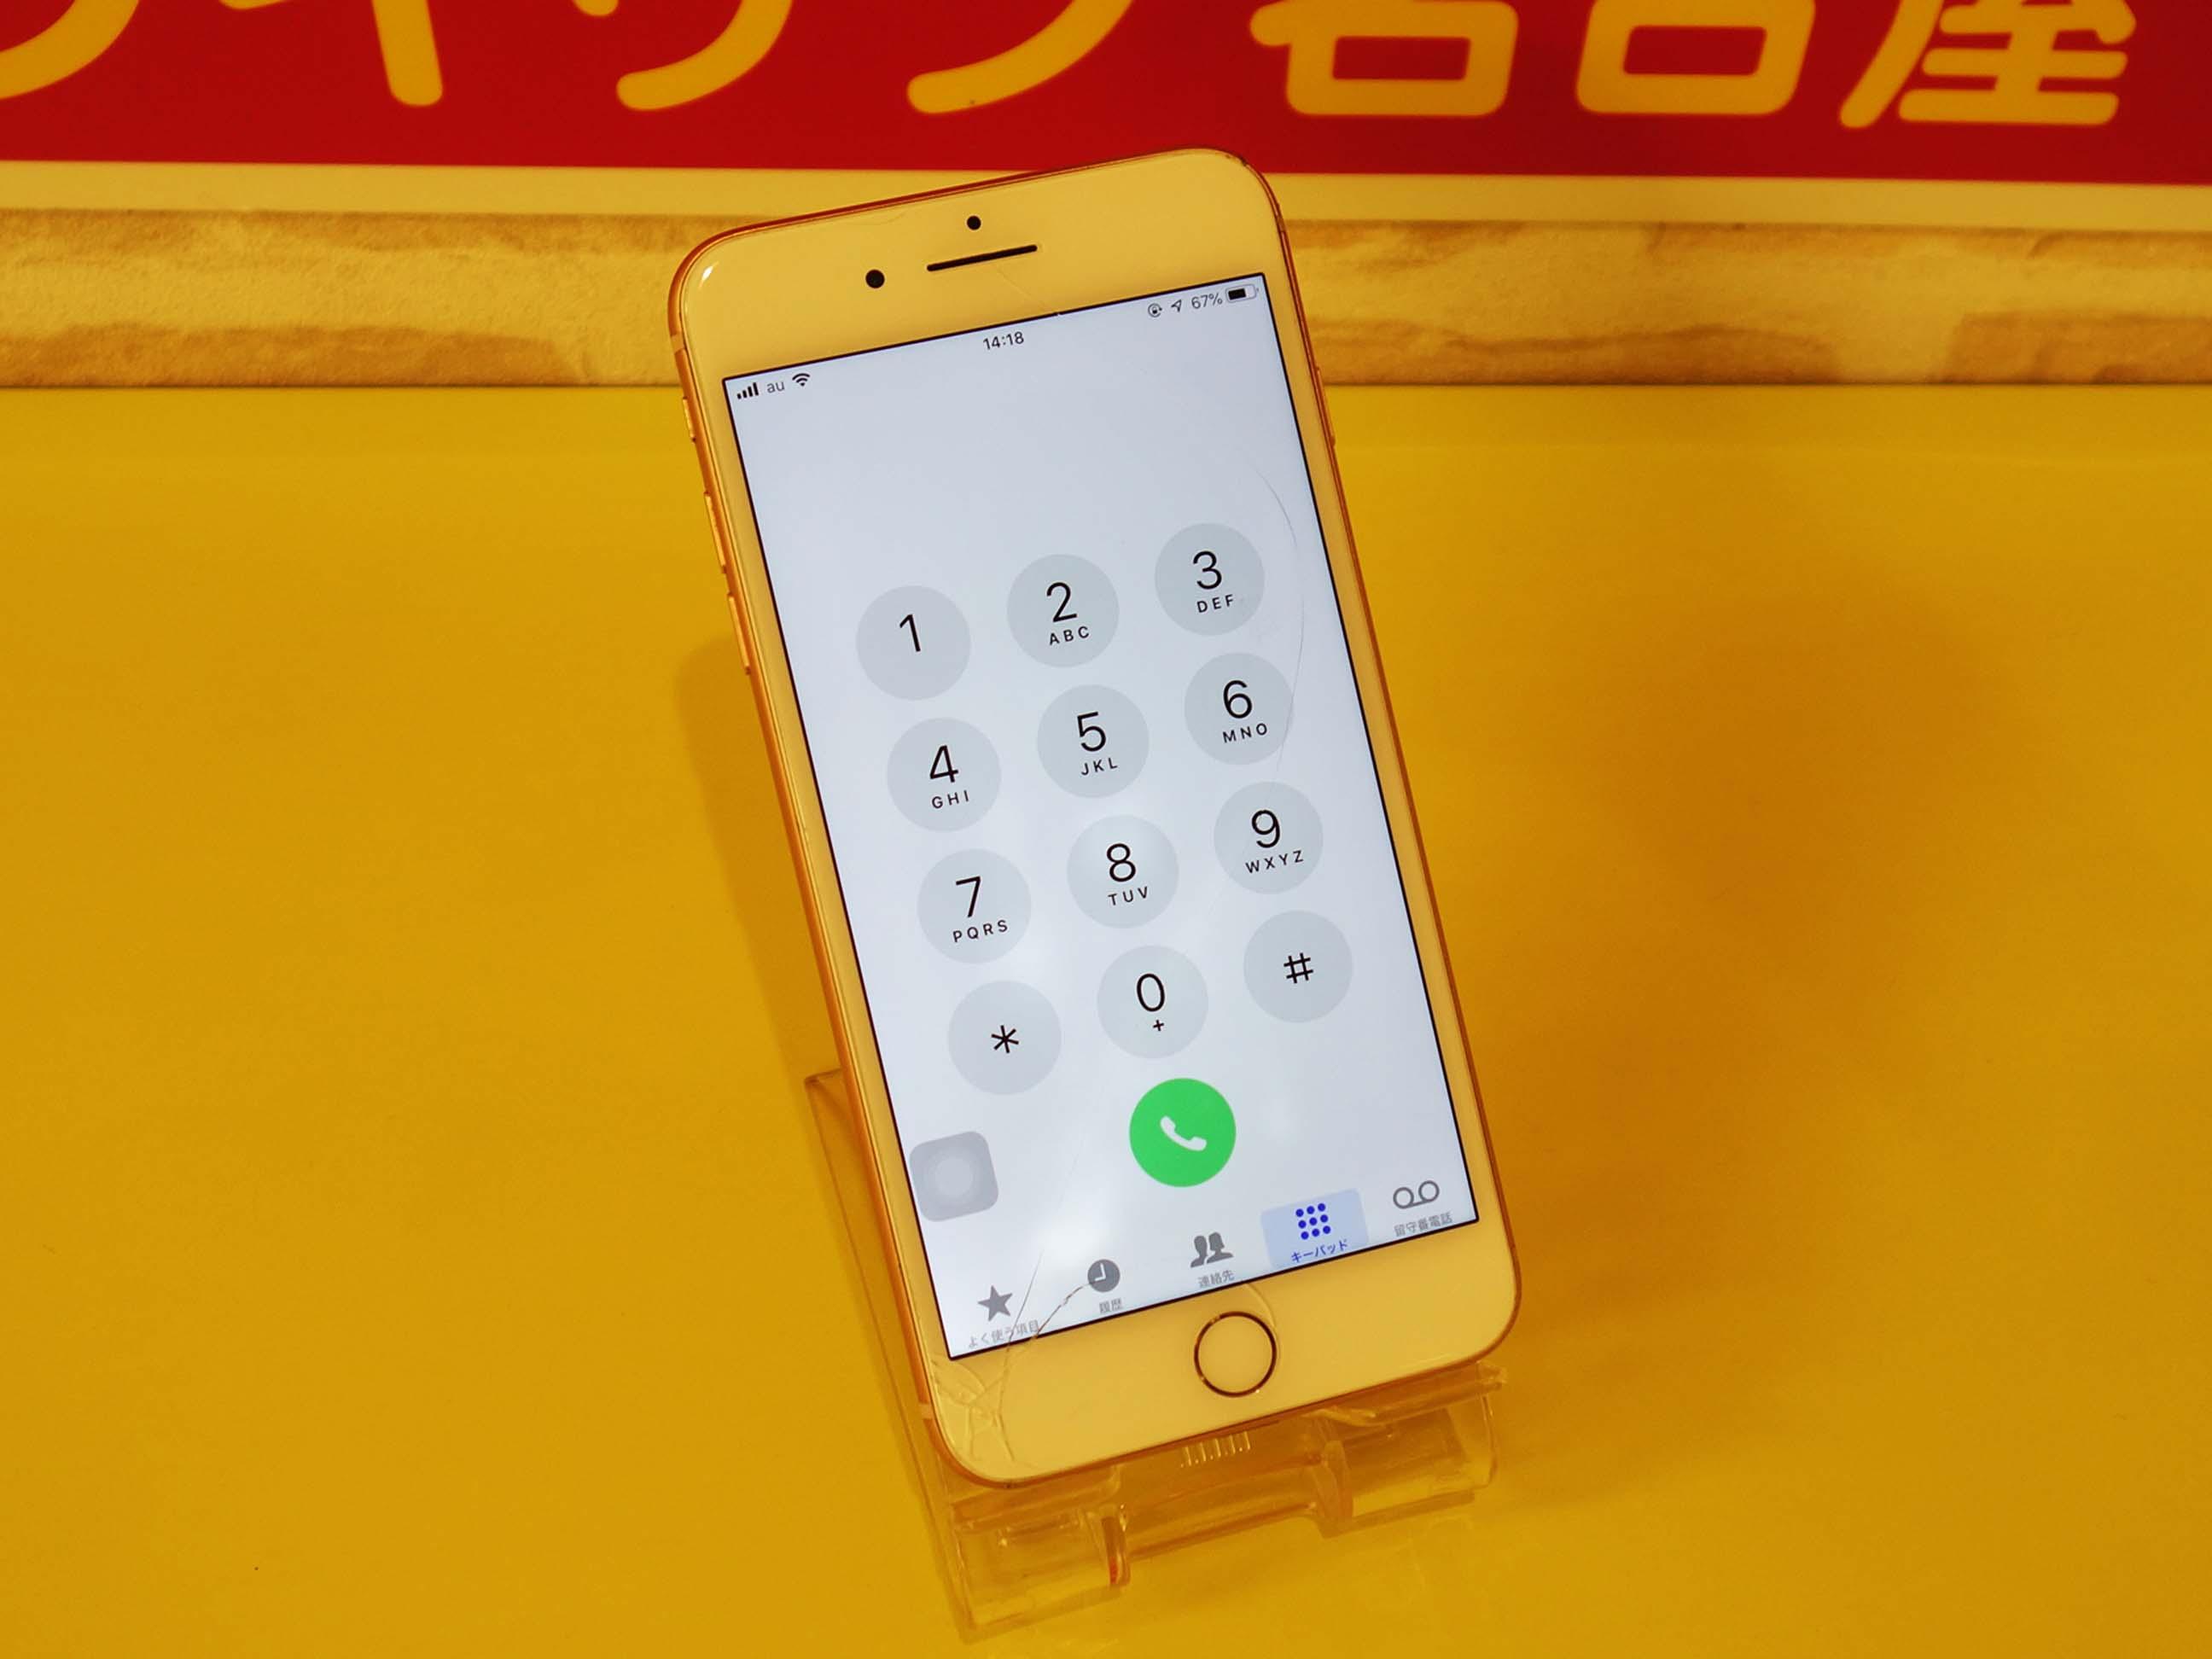 iPhone8Plusの液晶&ボリュームボタン修理に名古屋市内よりご来店!アイフォン修理のクイック名古屋